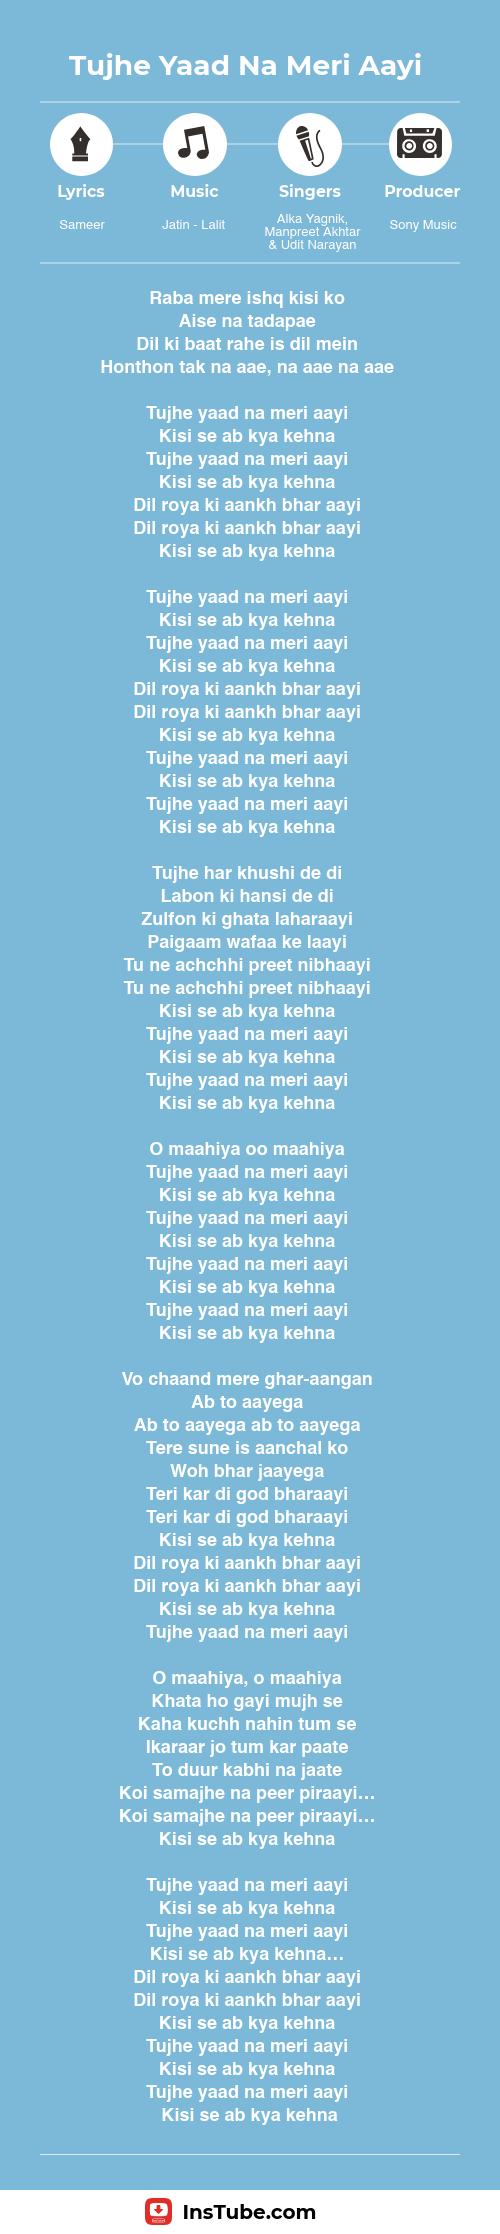 Kuch Kuch Hota Hai songs Tujhe Yaad Na Meri Aayee lyrics